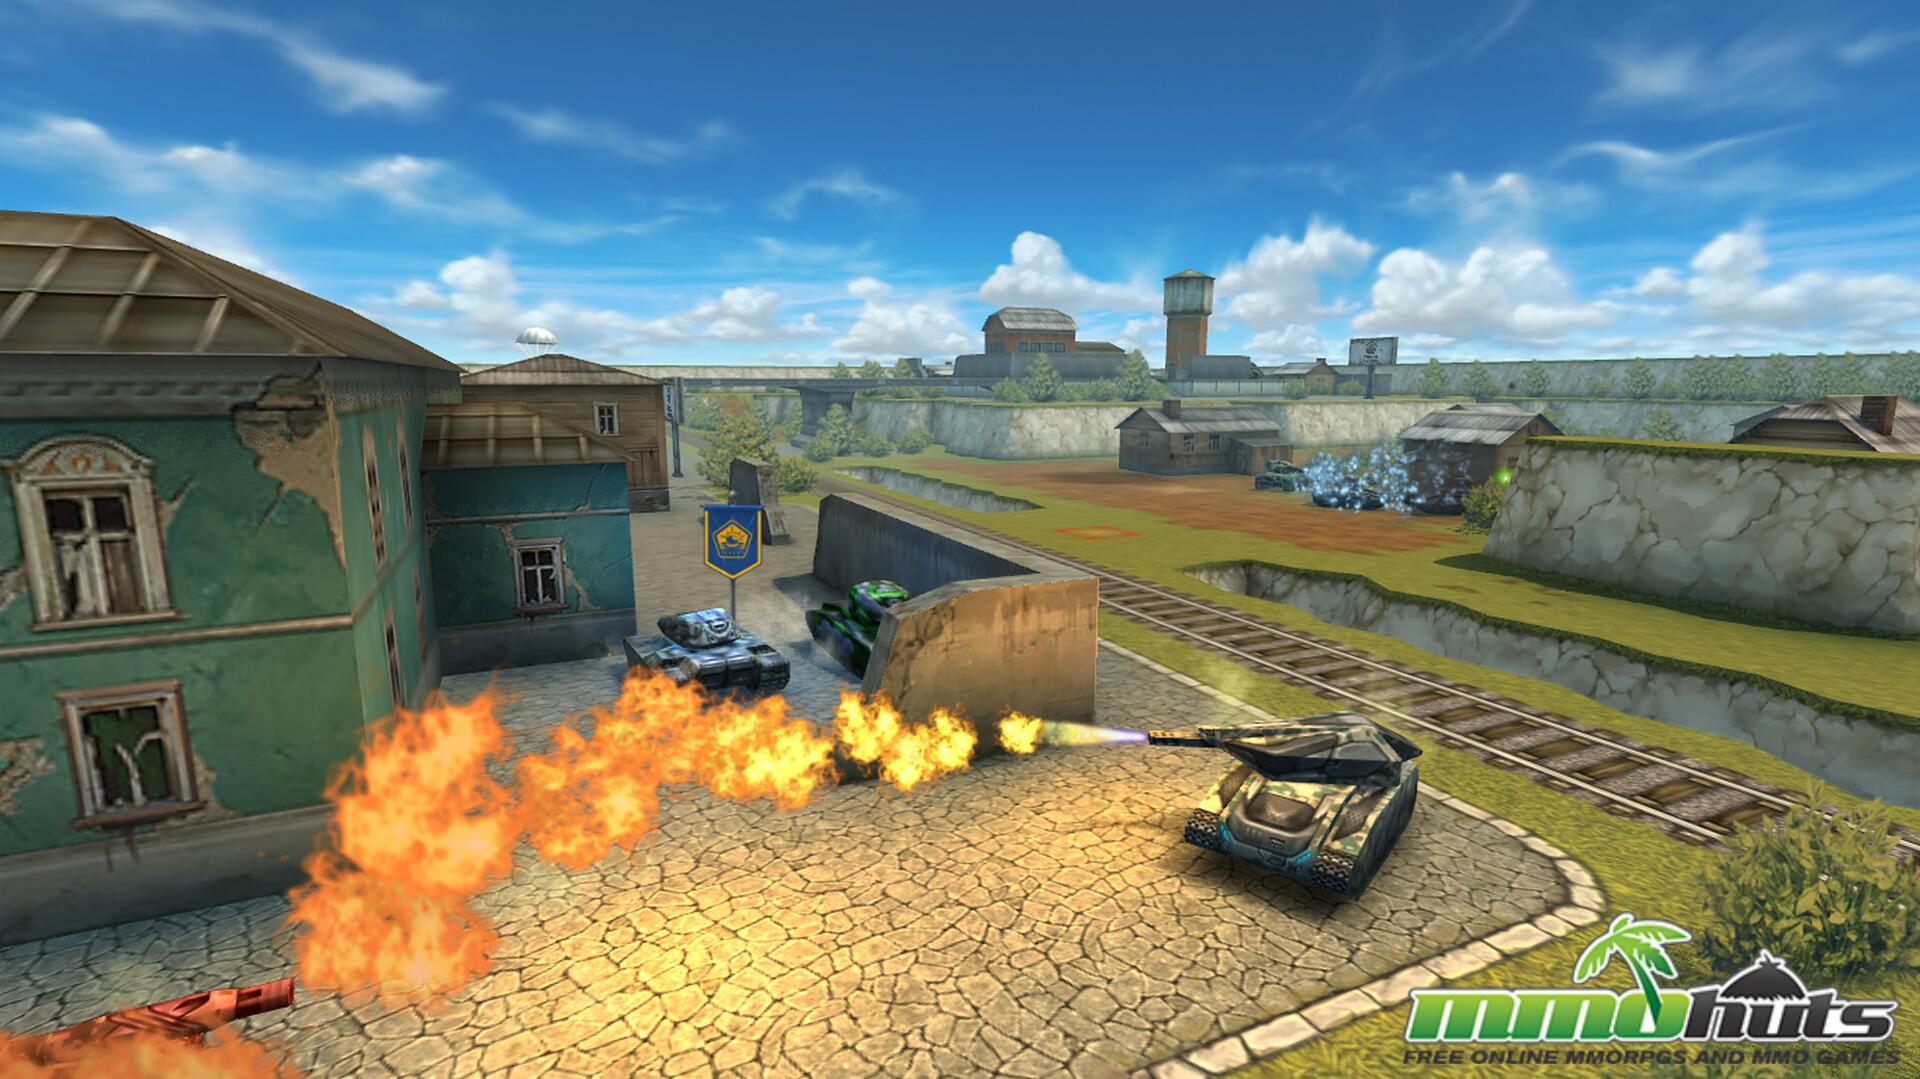 Tanki Online Free Online Game